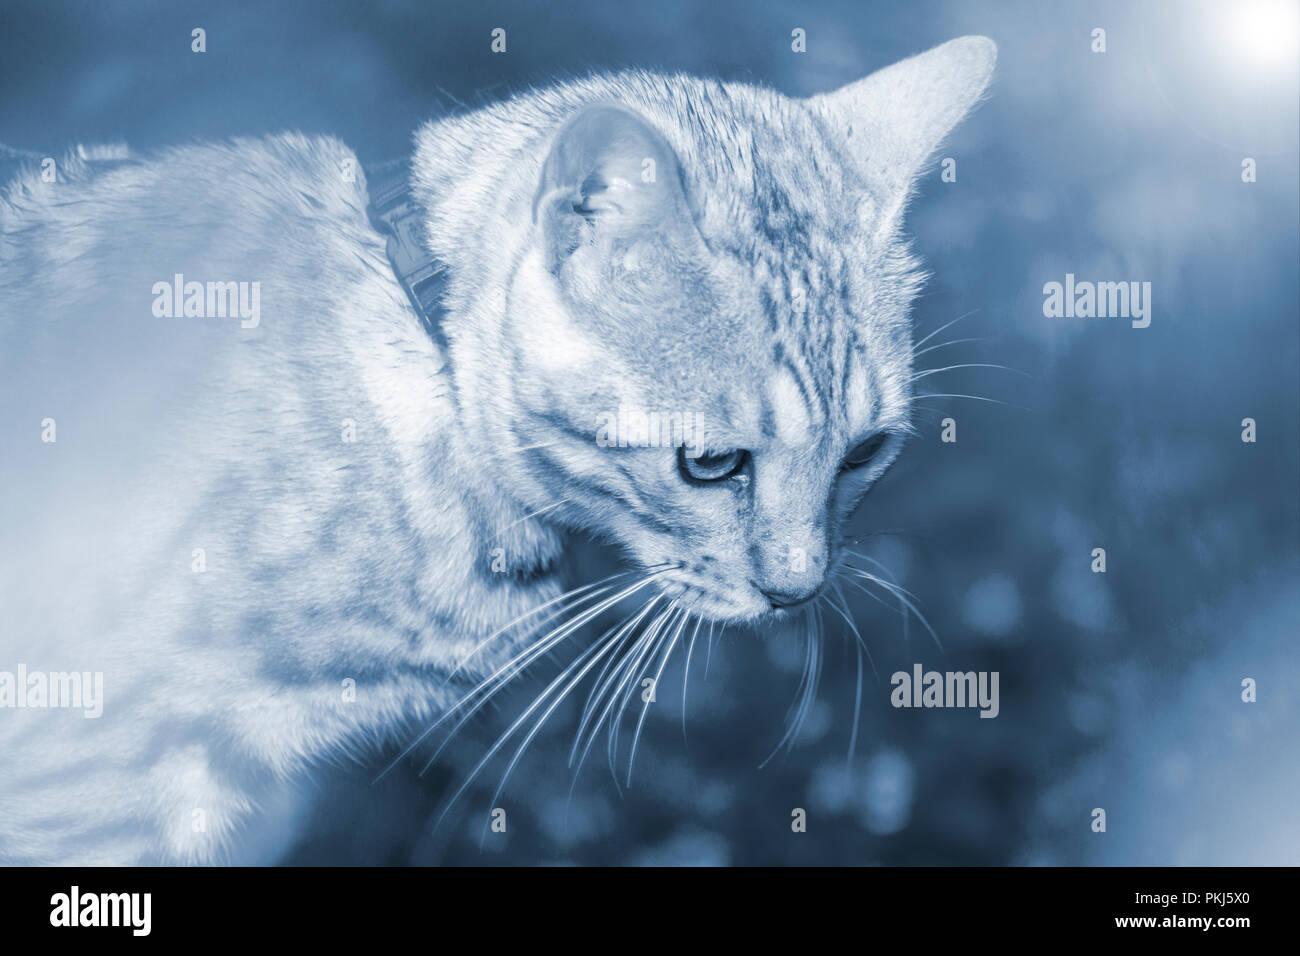 Beau mâle chaton Bengal silver portrait avec la tonalité bleu Photo Stock